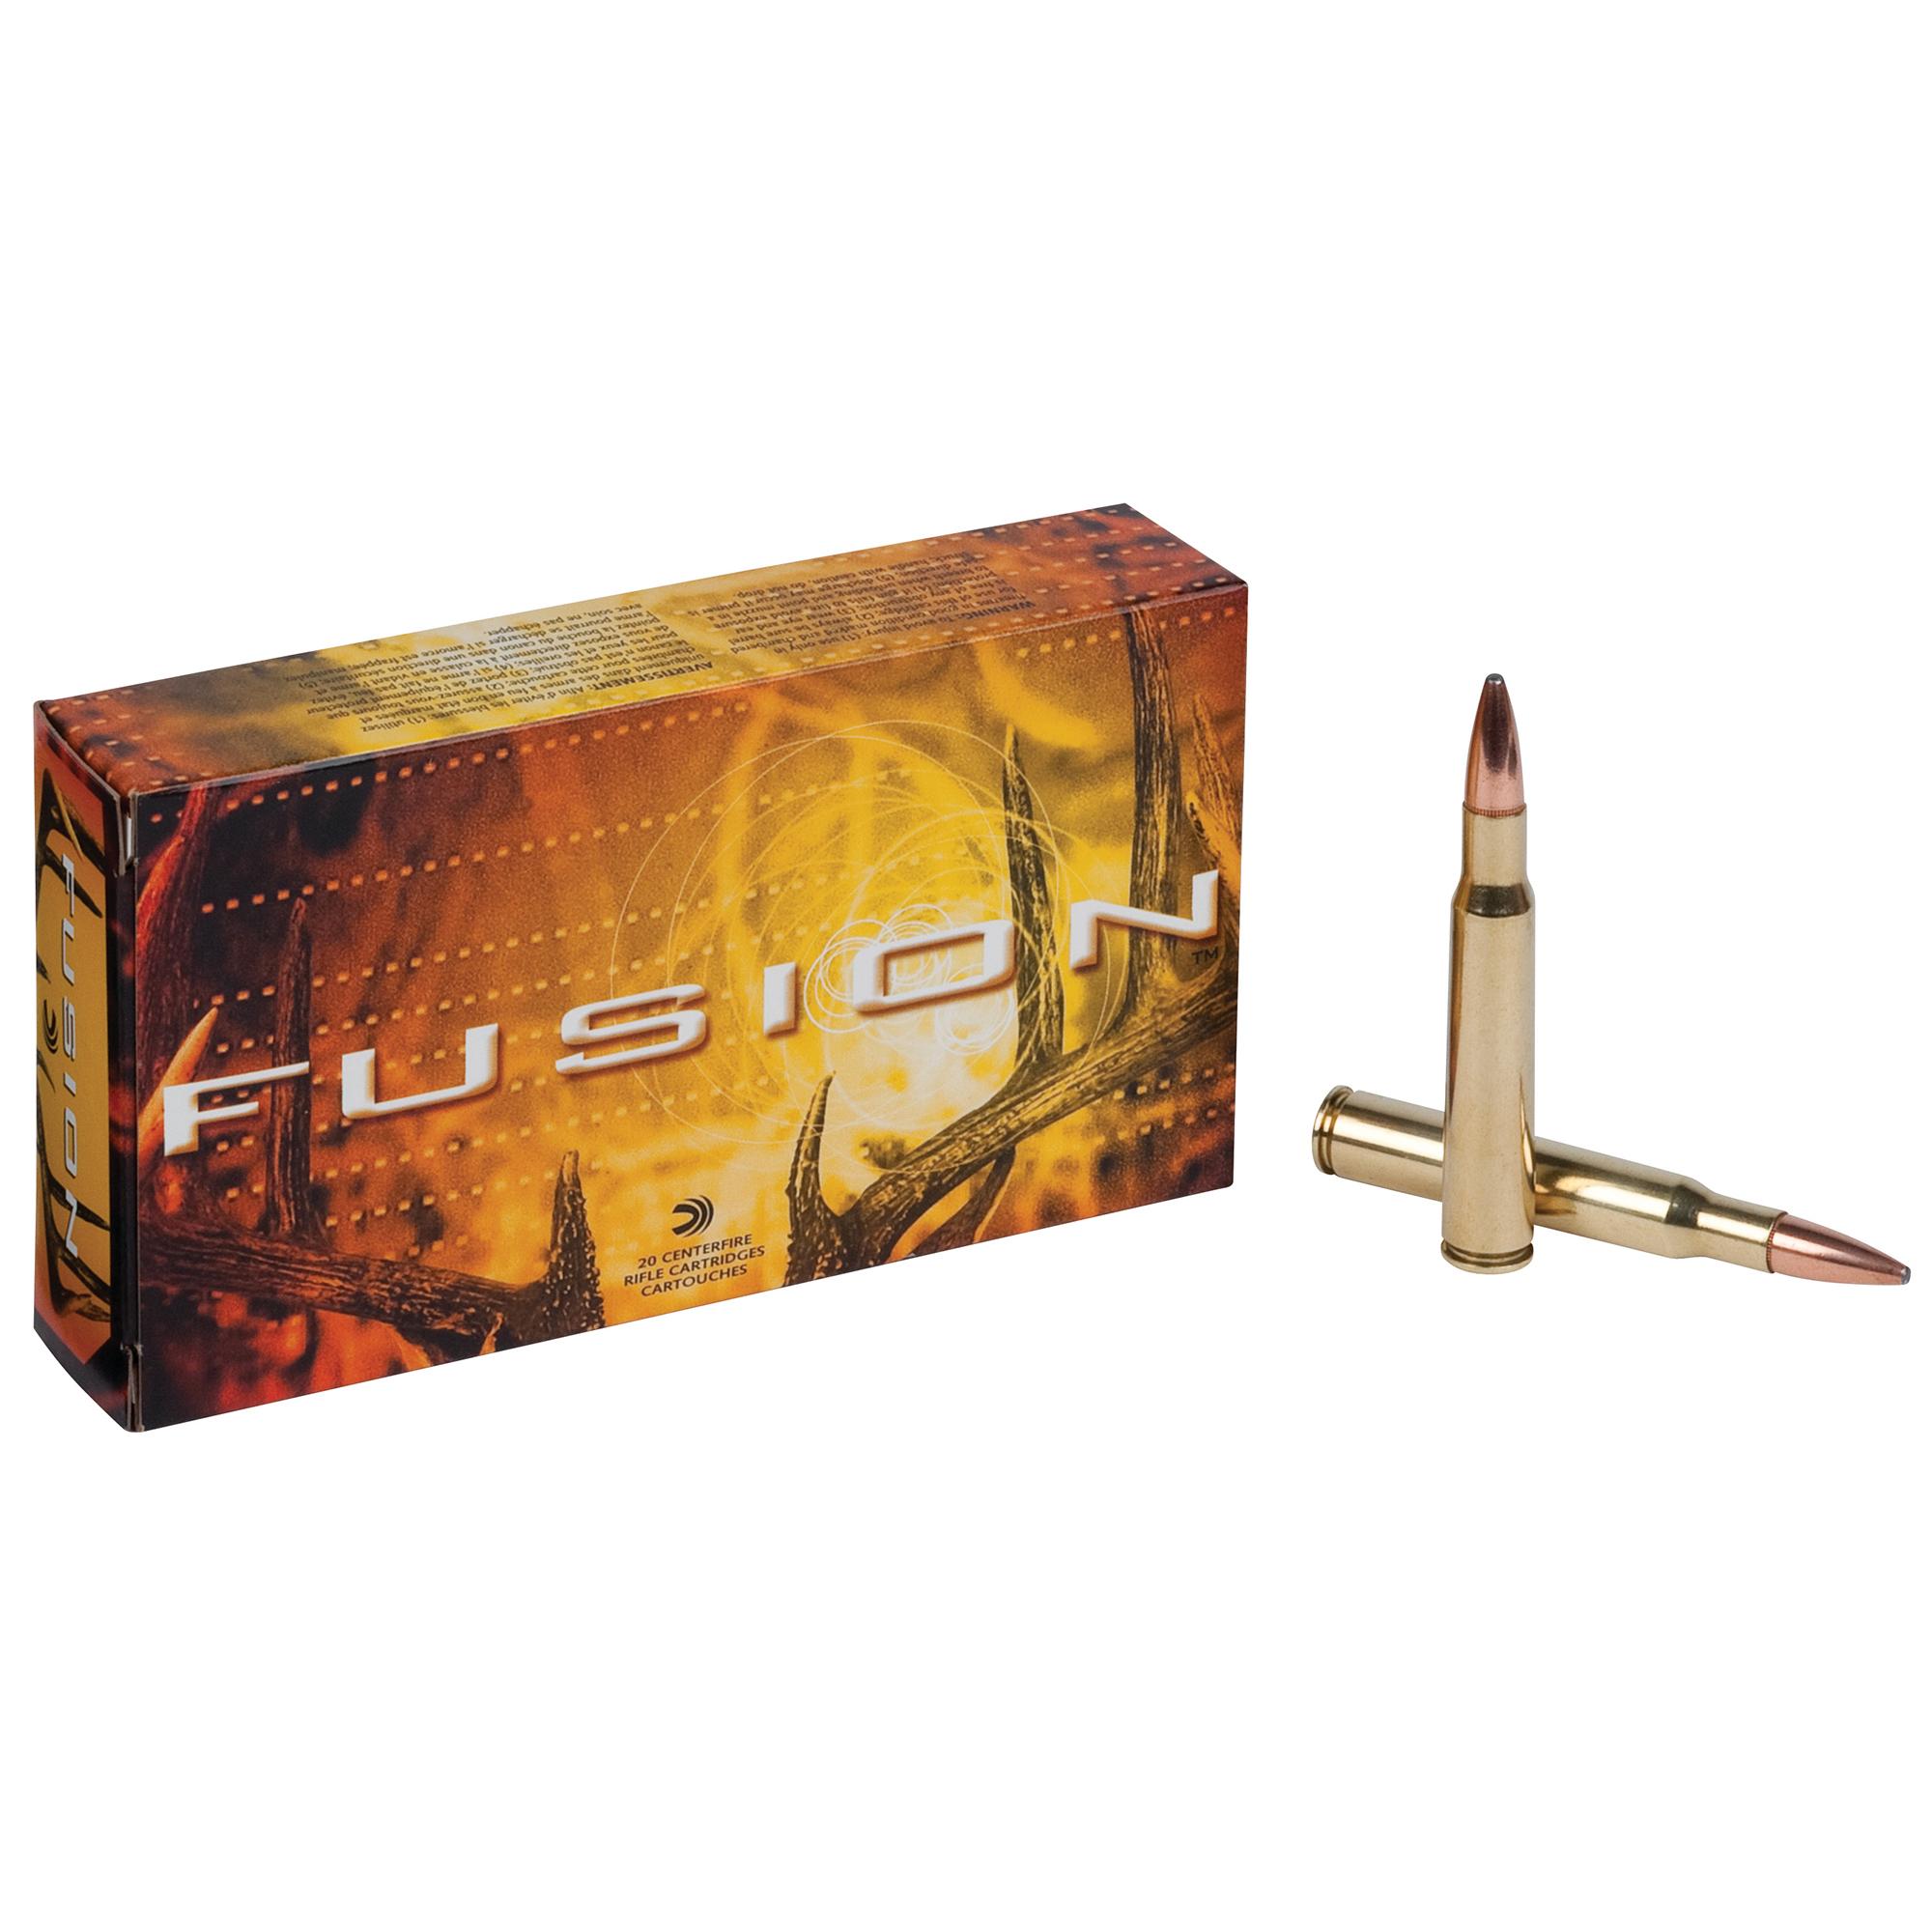 Fusion Rifle Ammunition, .30-06 Spring, 150-gr, BTSP